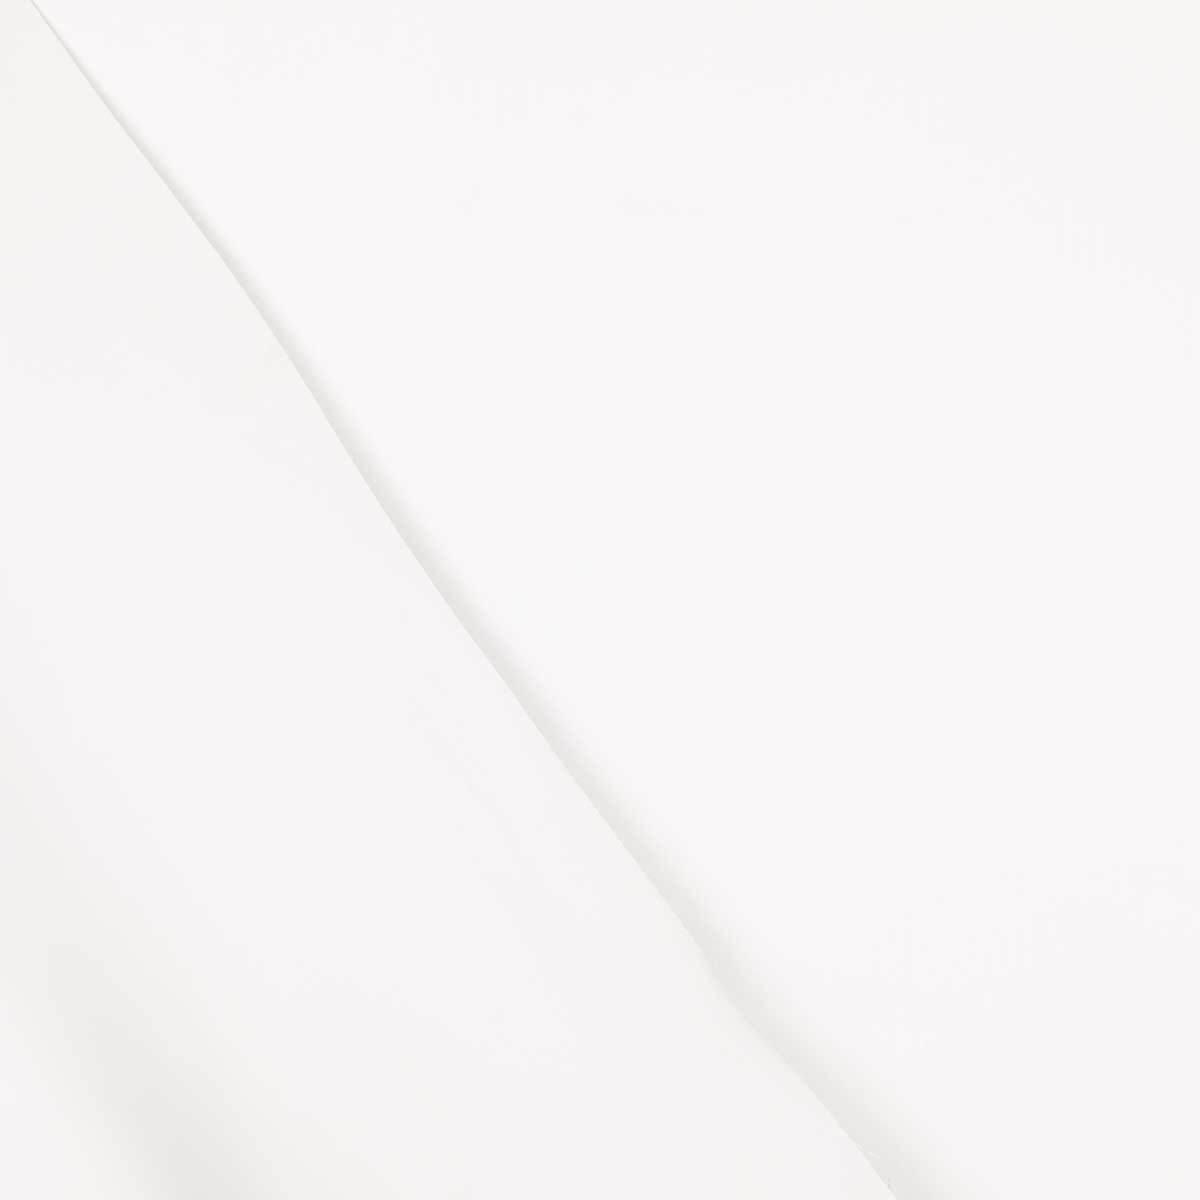 tissu occultant pour rideaux blanc mercerie car fil. Black Bedroom Furniture Sets. Home Design Ideas